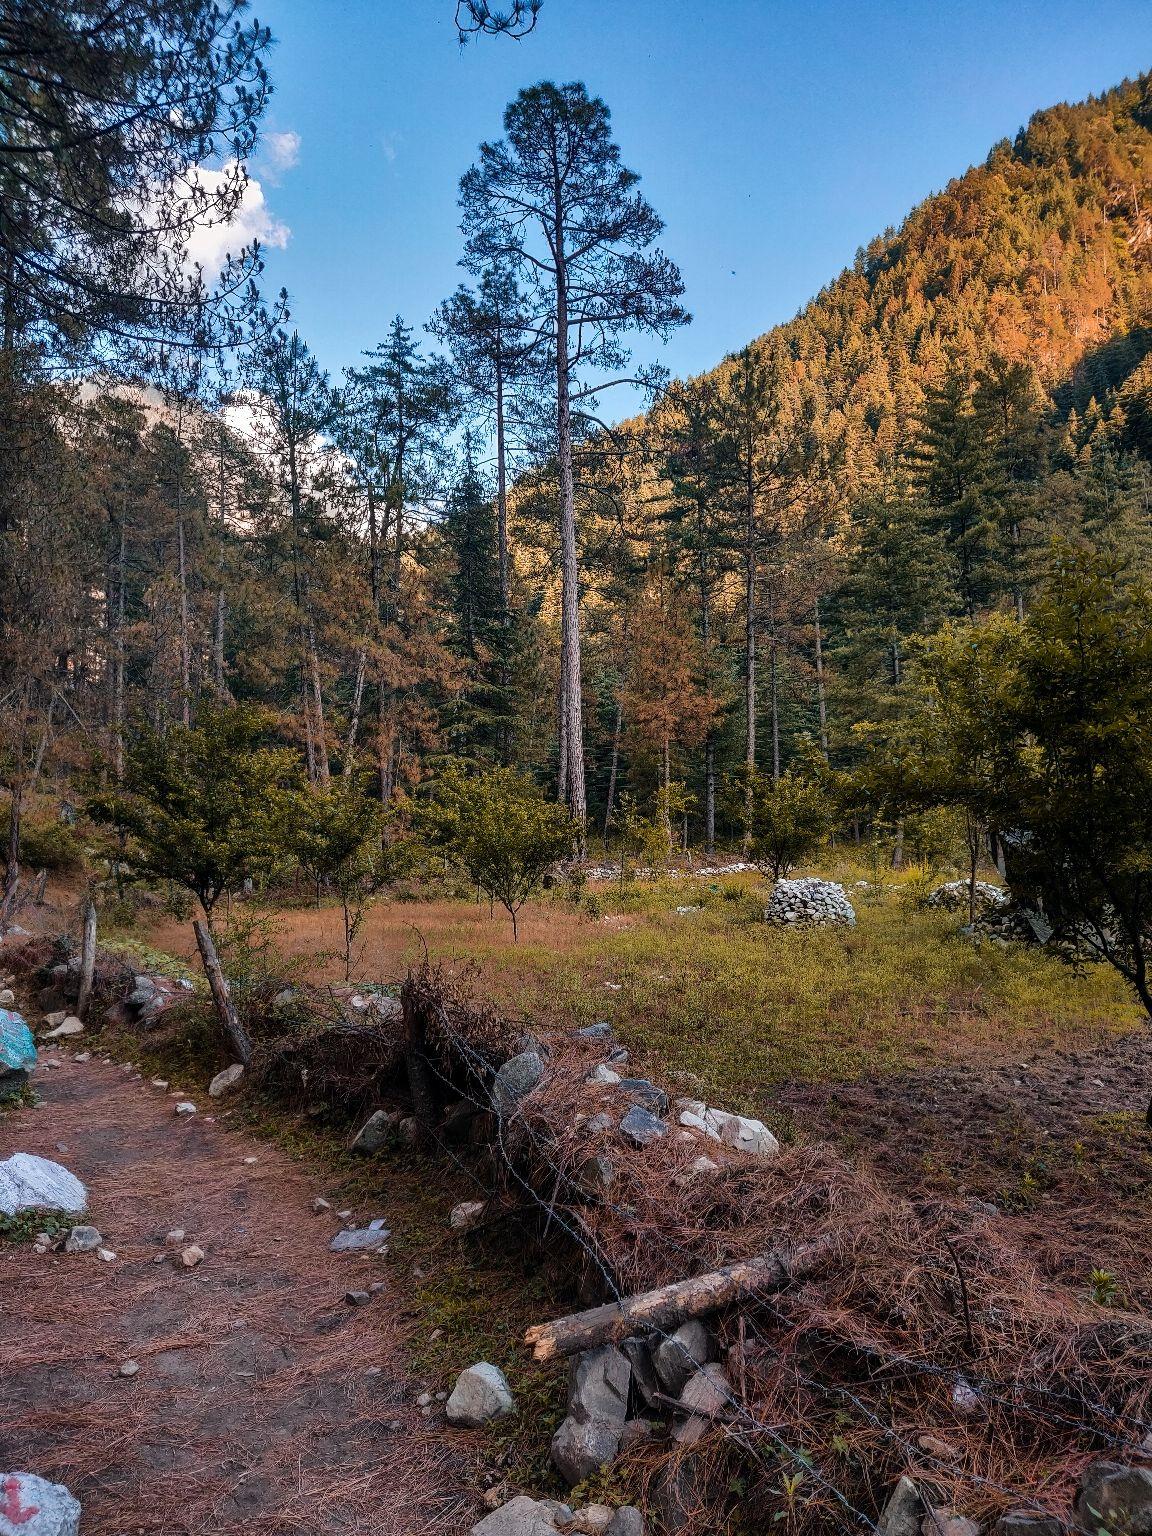 Photo of Himachal Pradesh By Vipul Bhatia